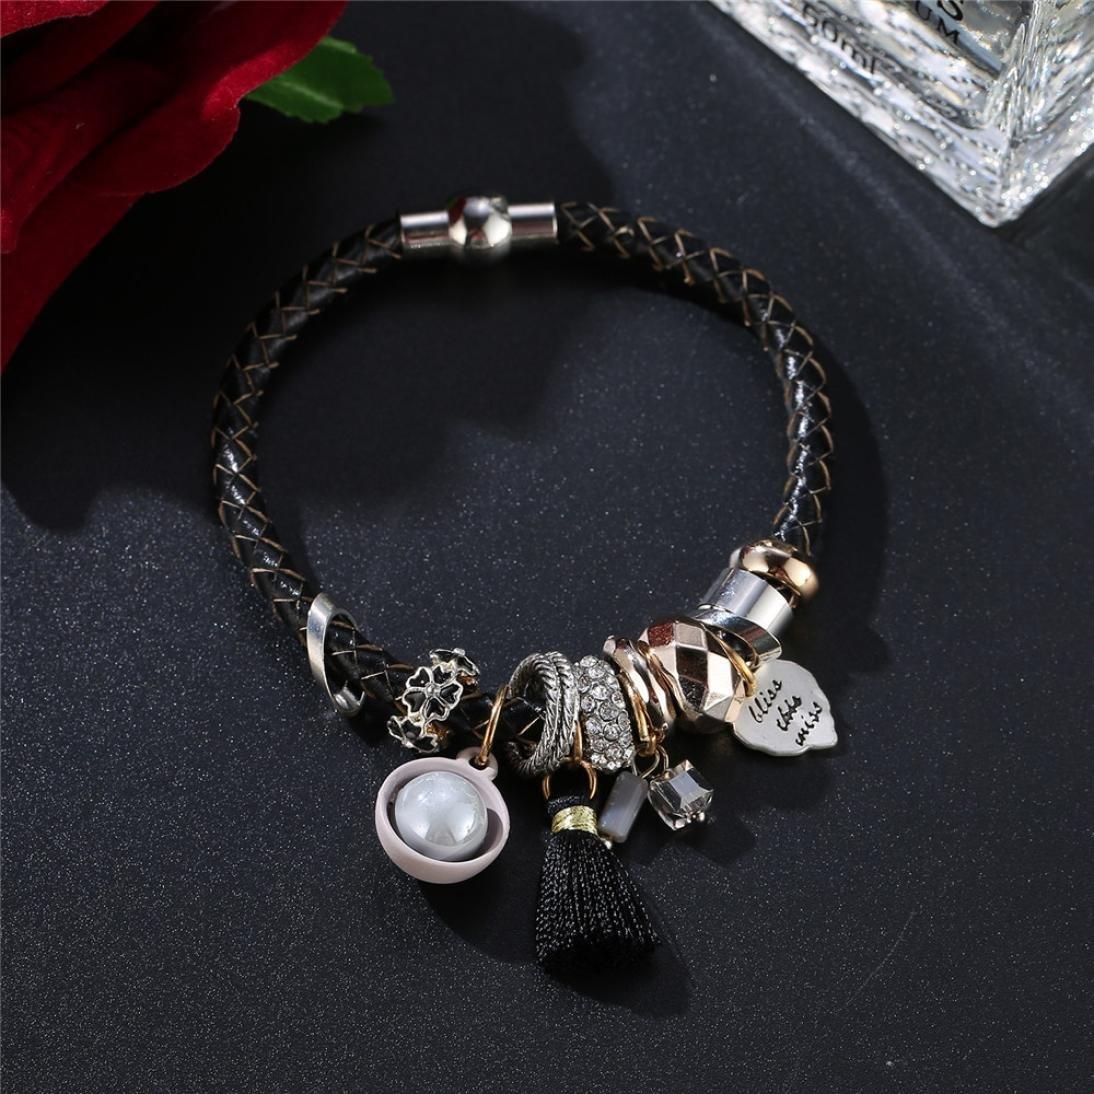 DENER Beaded Pearl Rhinestones Alloy Risers Acrylic Layer Hand-woven Braided Wire Bangle Bracelet